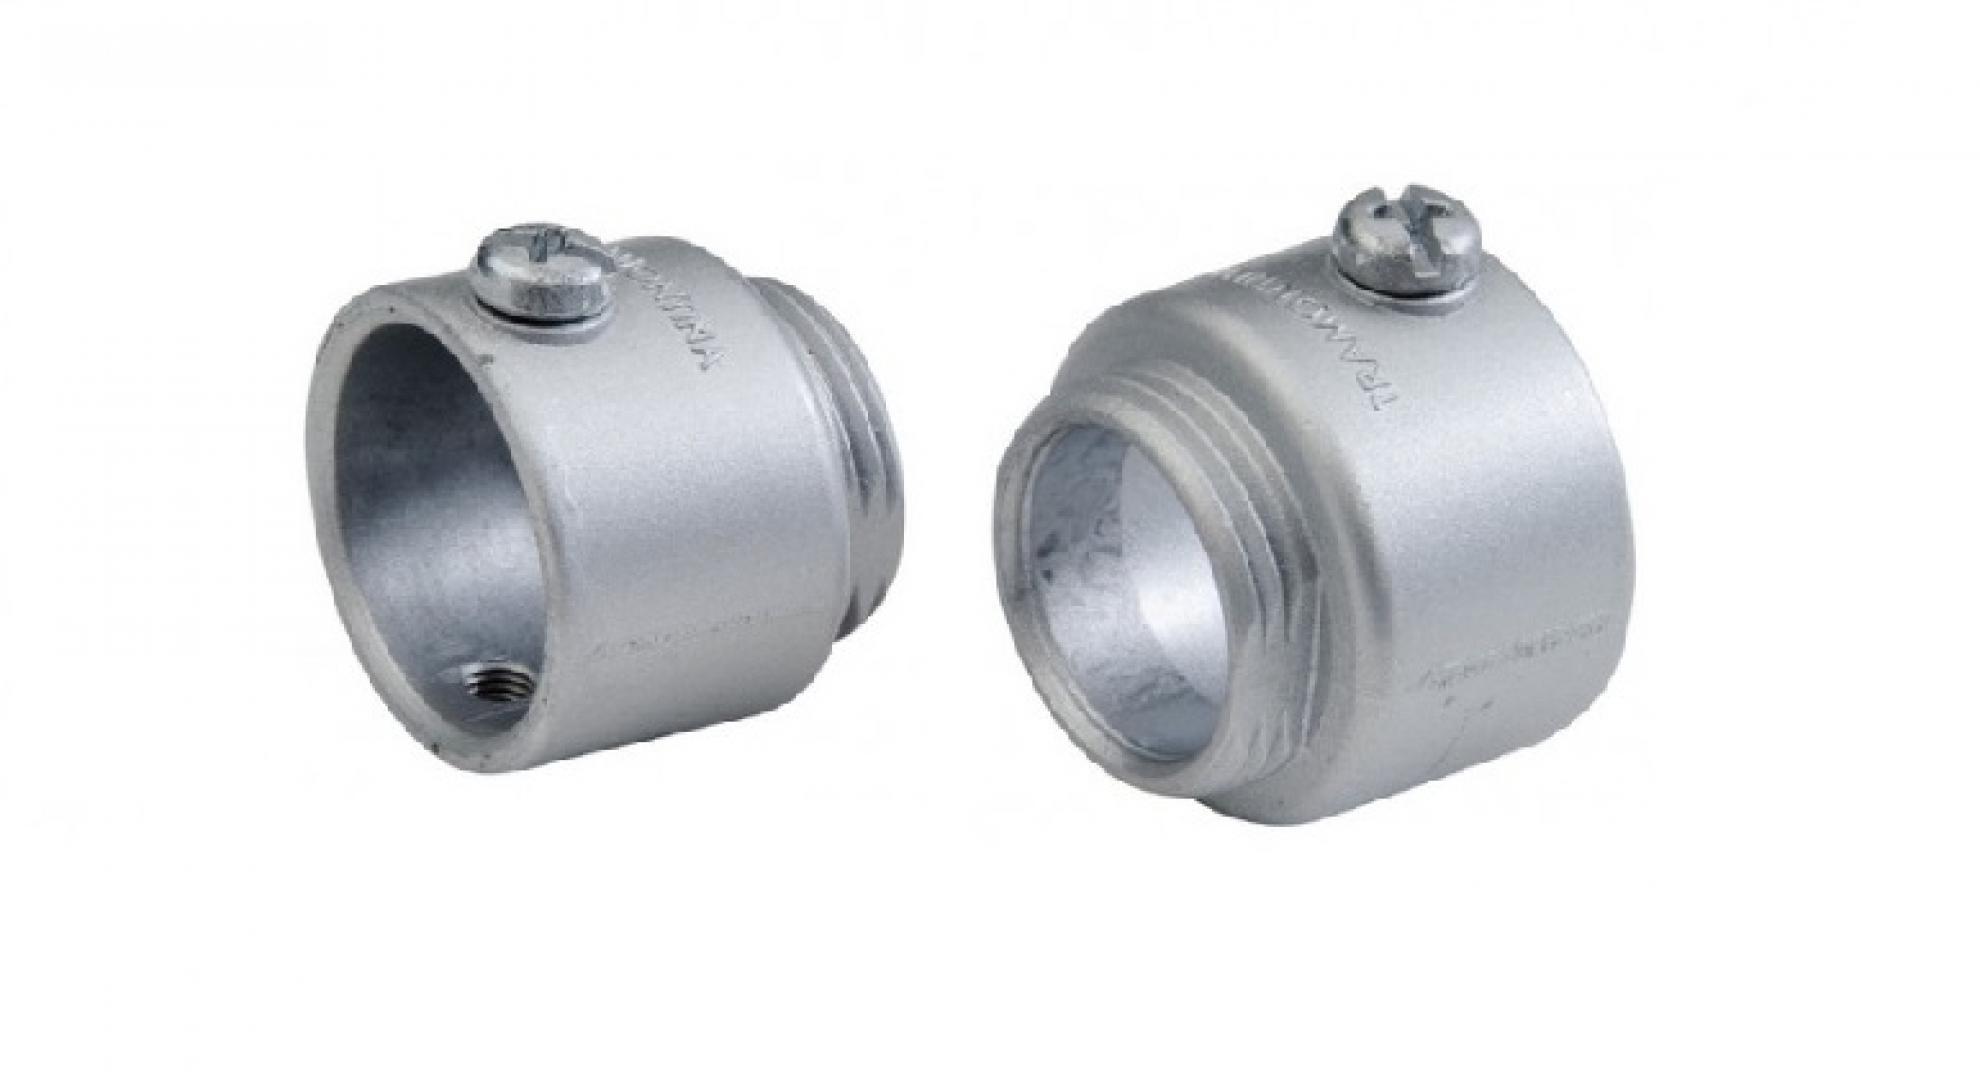 Conector Caixa Multipla 1.1/2 PI 1/4 Polegadas